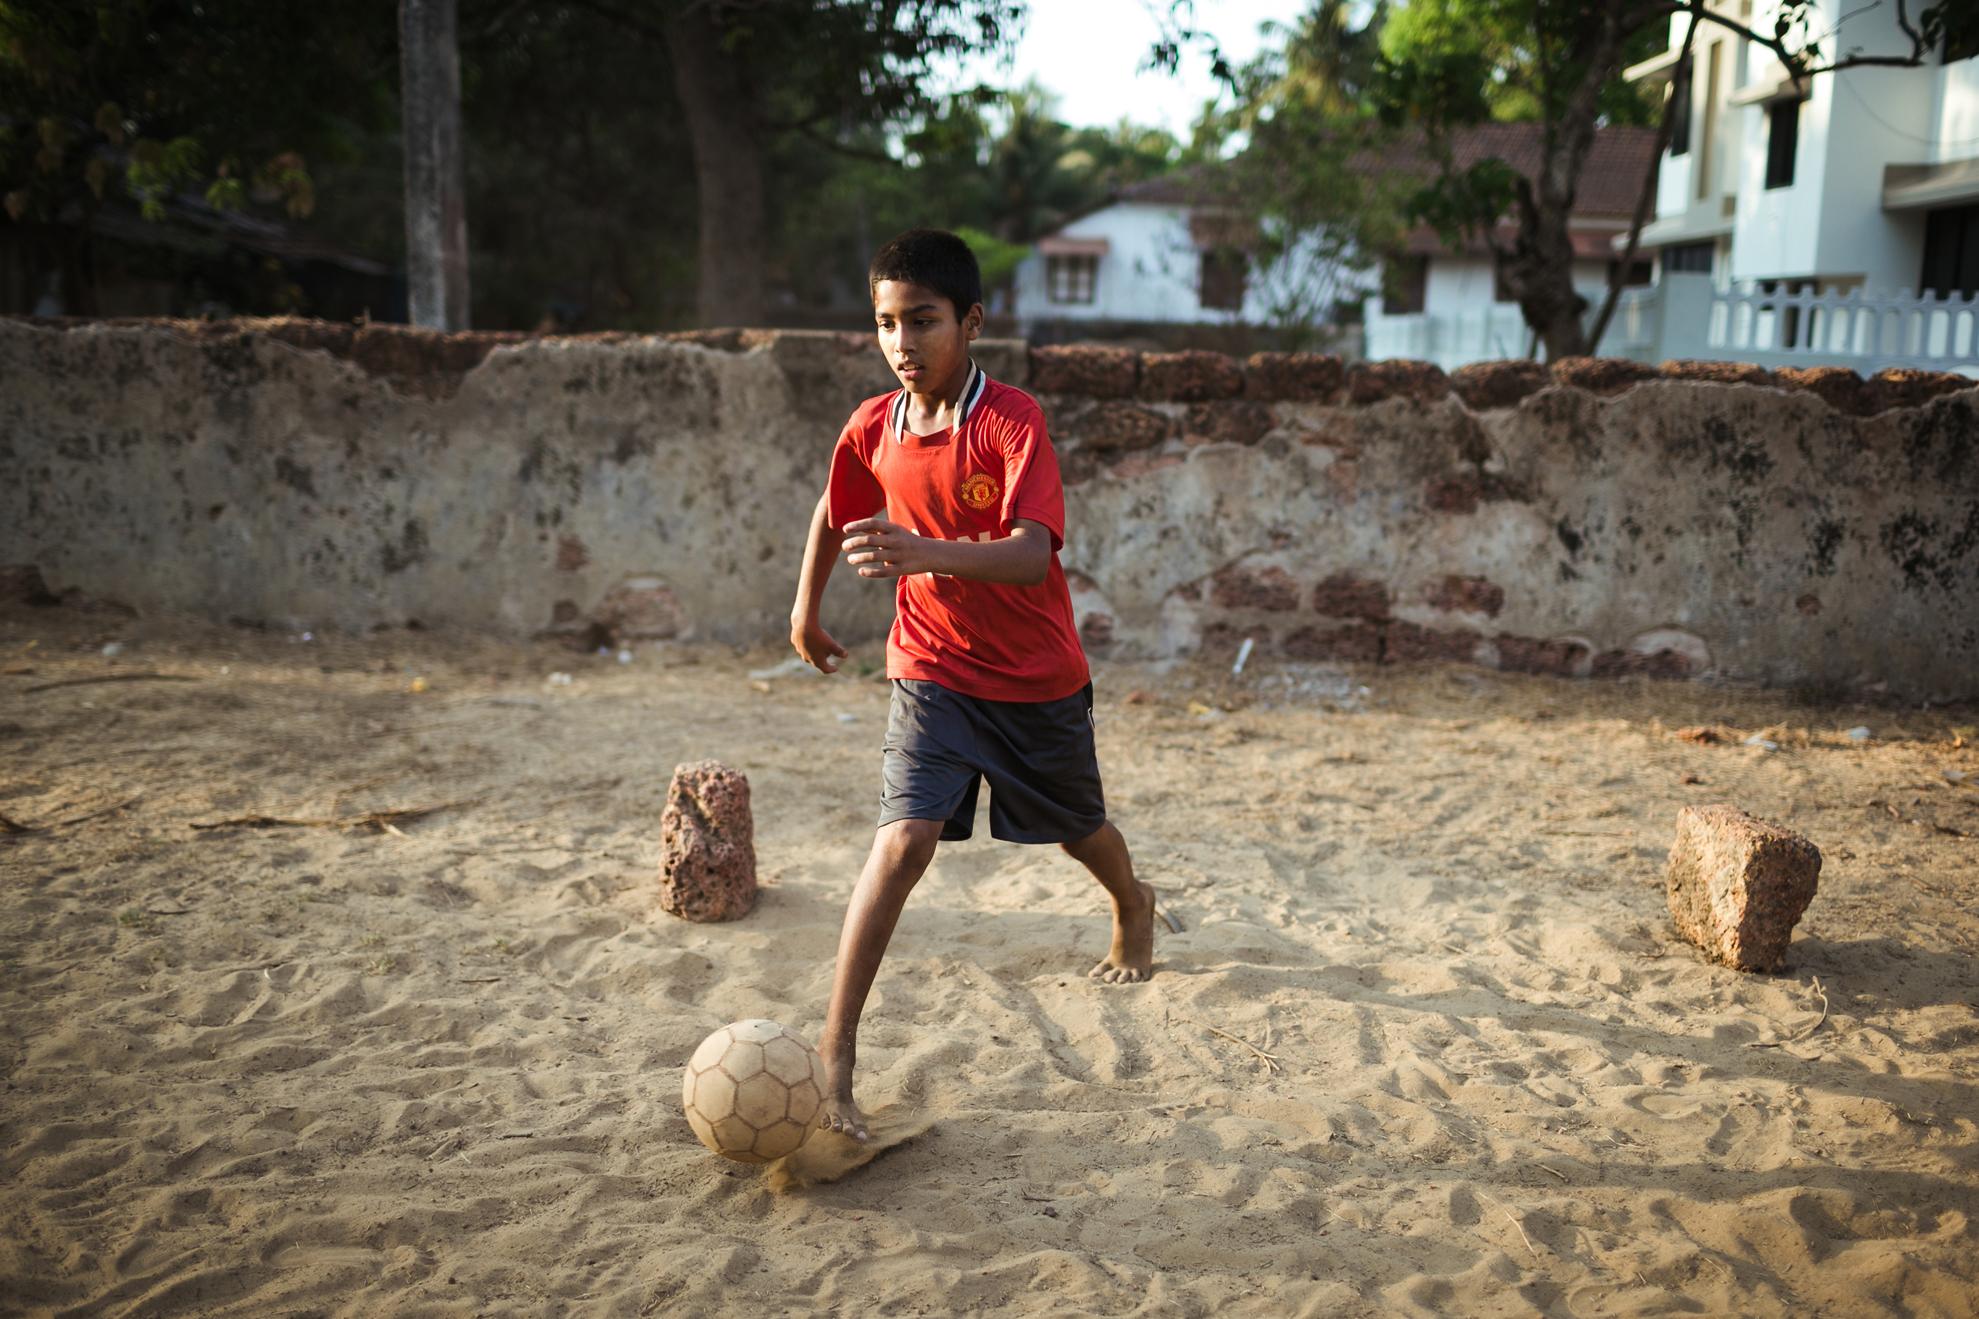 indian street football